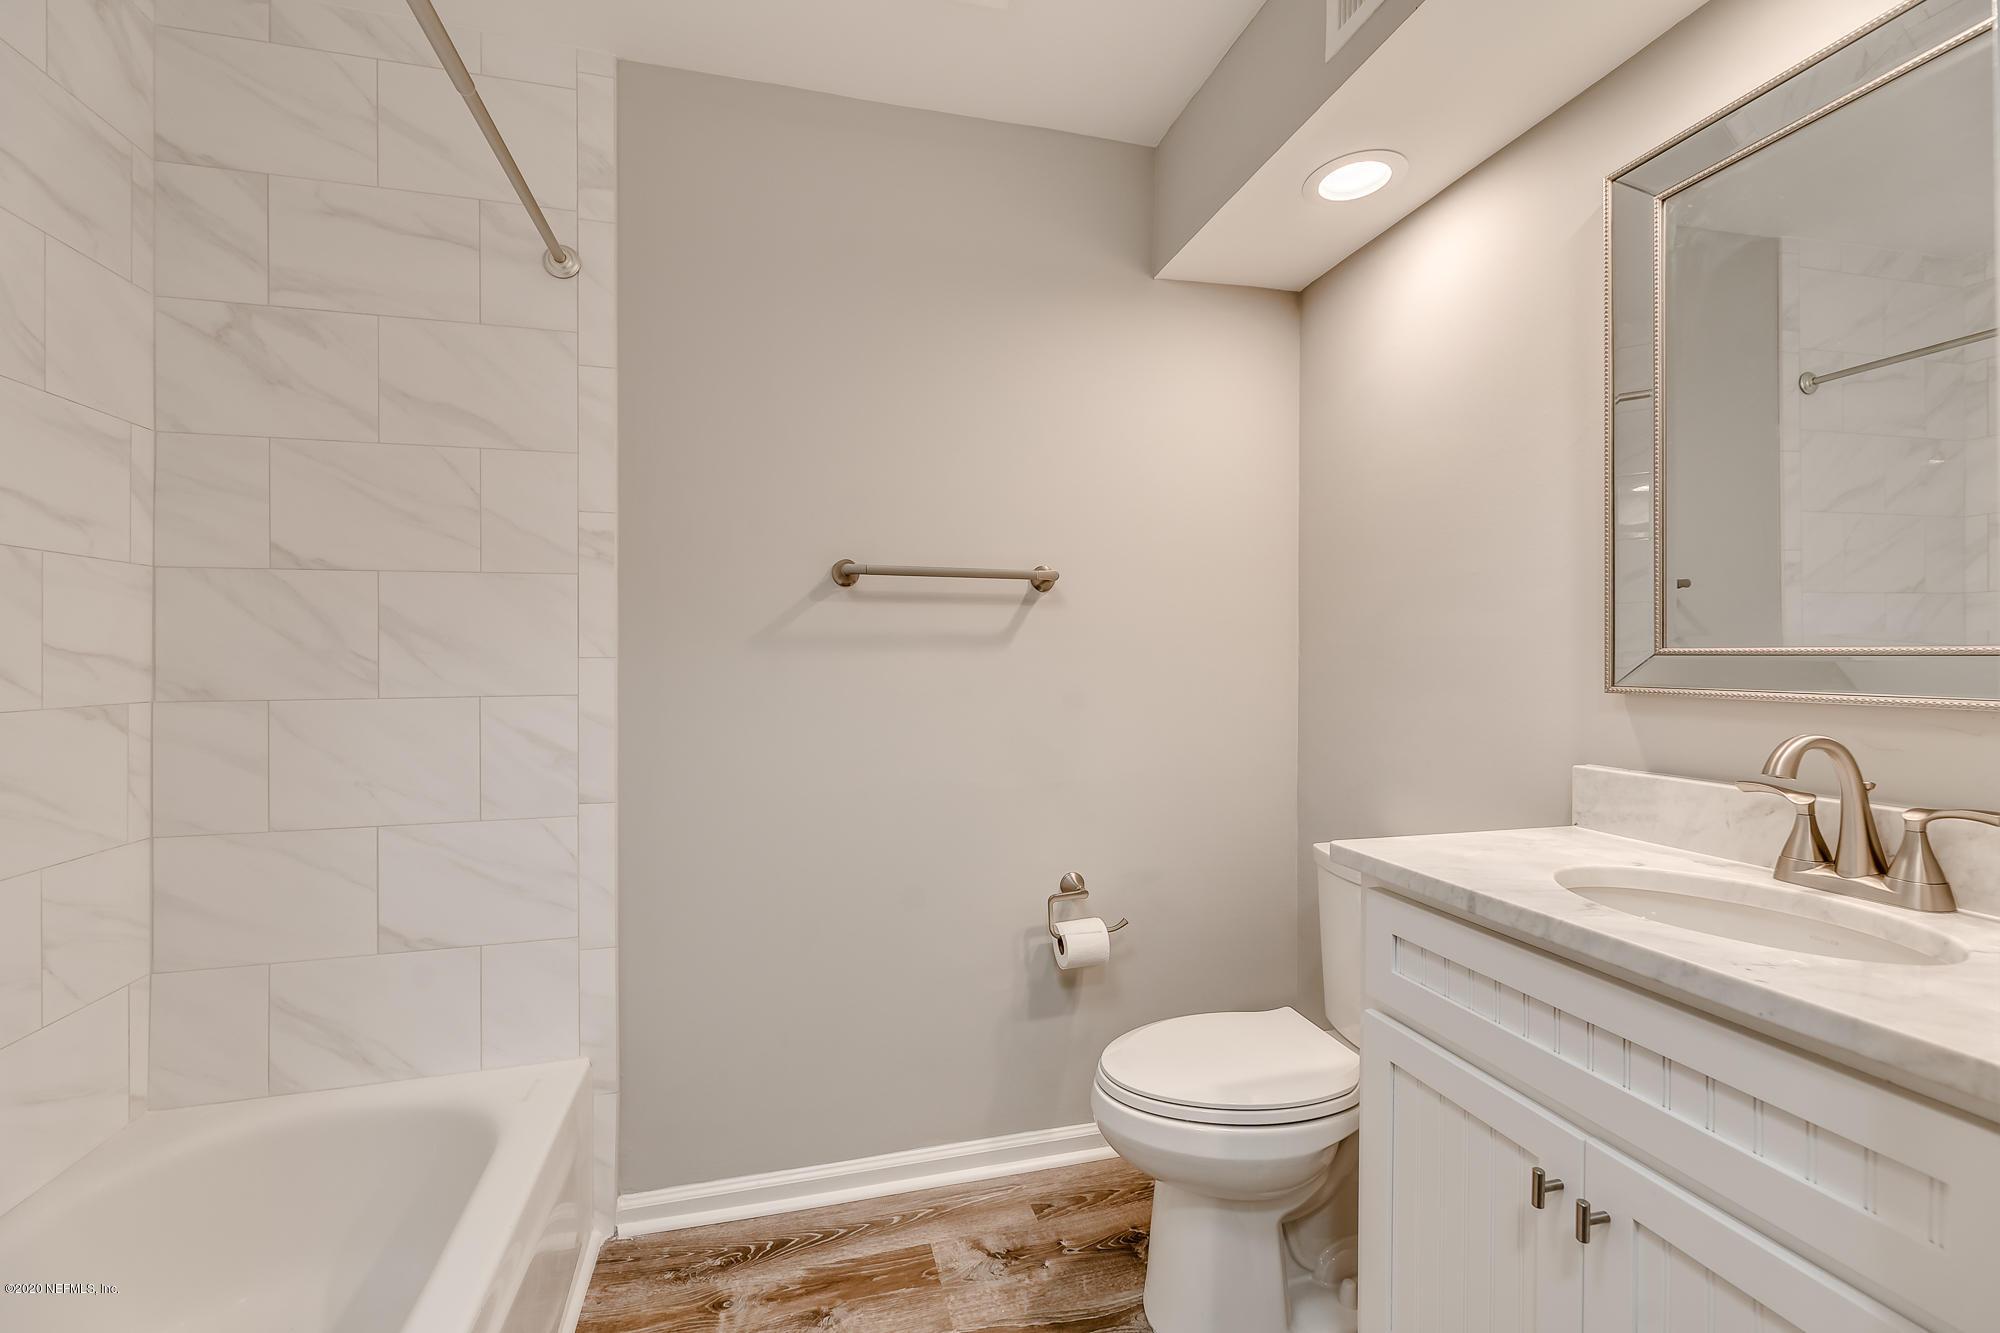 92 PONTE VEDRA COLONY, PONTE VEDRA BEACH, FLORIDA 32082, 2 Bedrooms Bedrooms, ,2 BathroomsBathrooms,Rental,For Rent,PONTE VEDRA COLONY,1083074